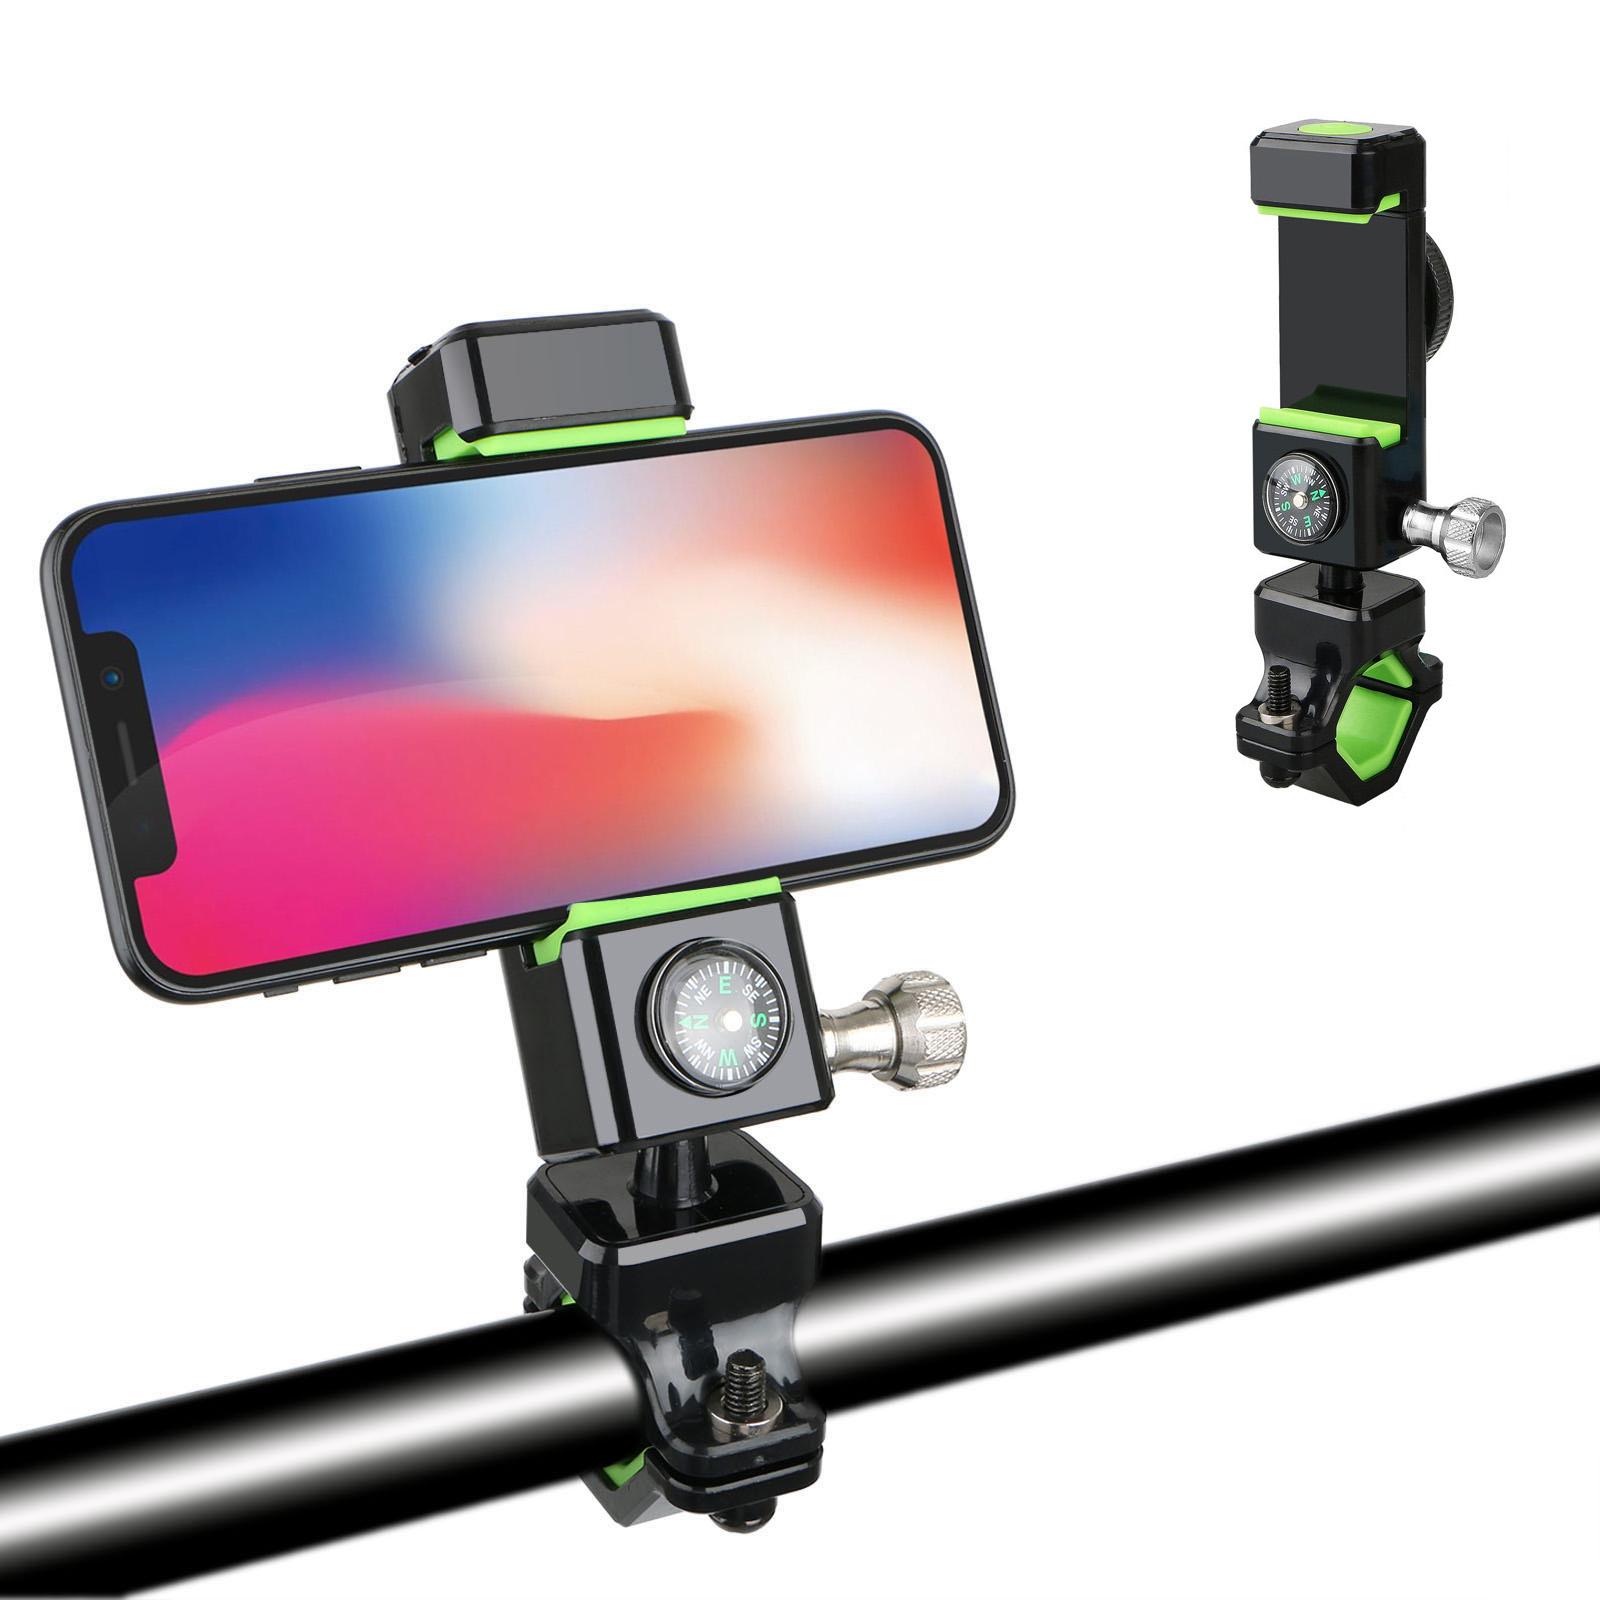 Aluminum Bicycle MTB Bike Mount Motorcycle Handlebar Phone Holder for iPhone 8/X